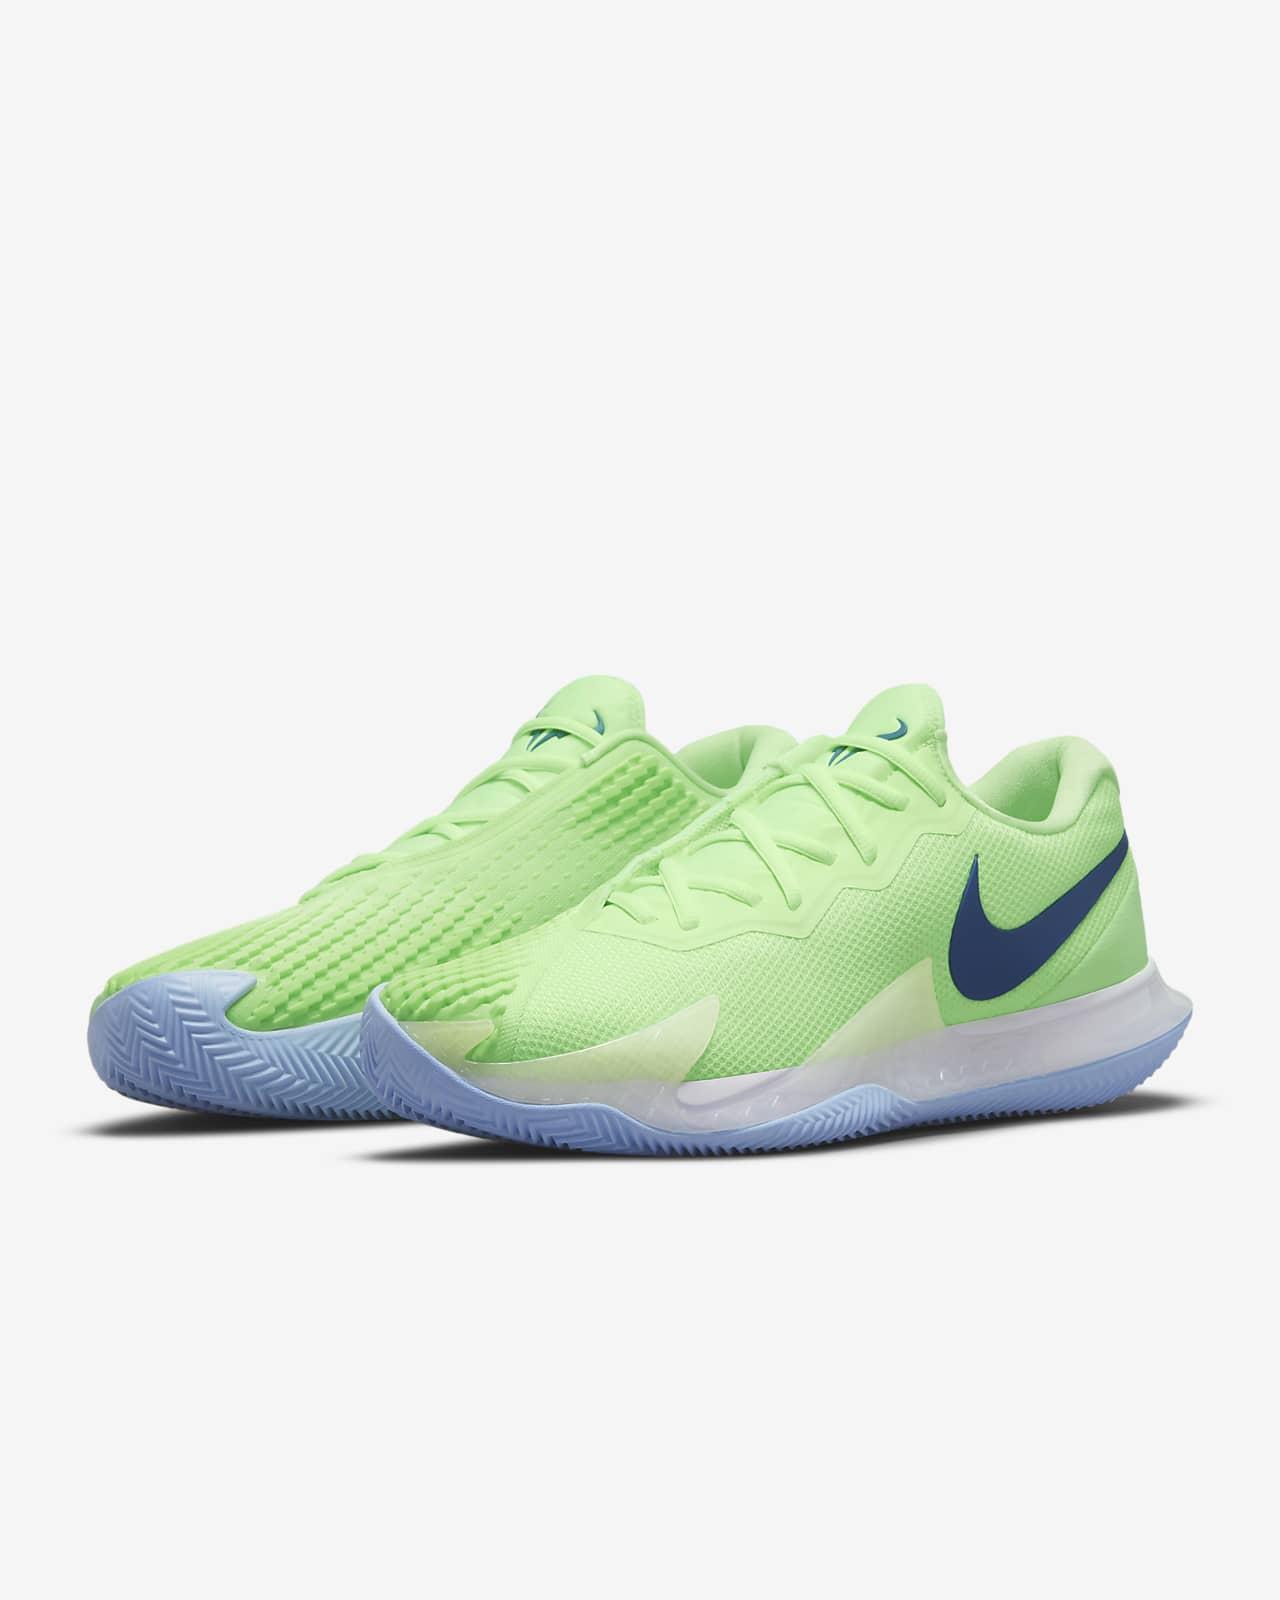 NikeCourt Air Zoom Vapor Cage 4 Rafa Men's Clay Court Tennis Shoe